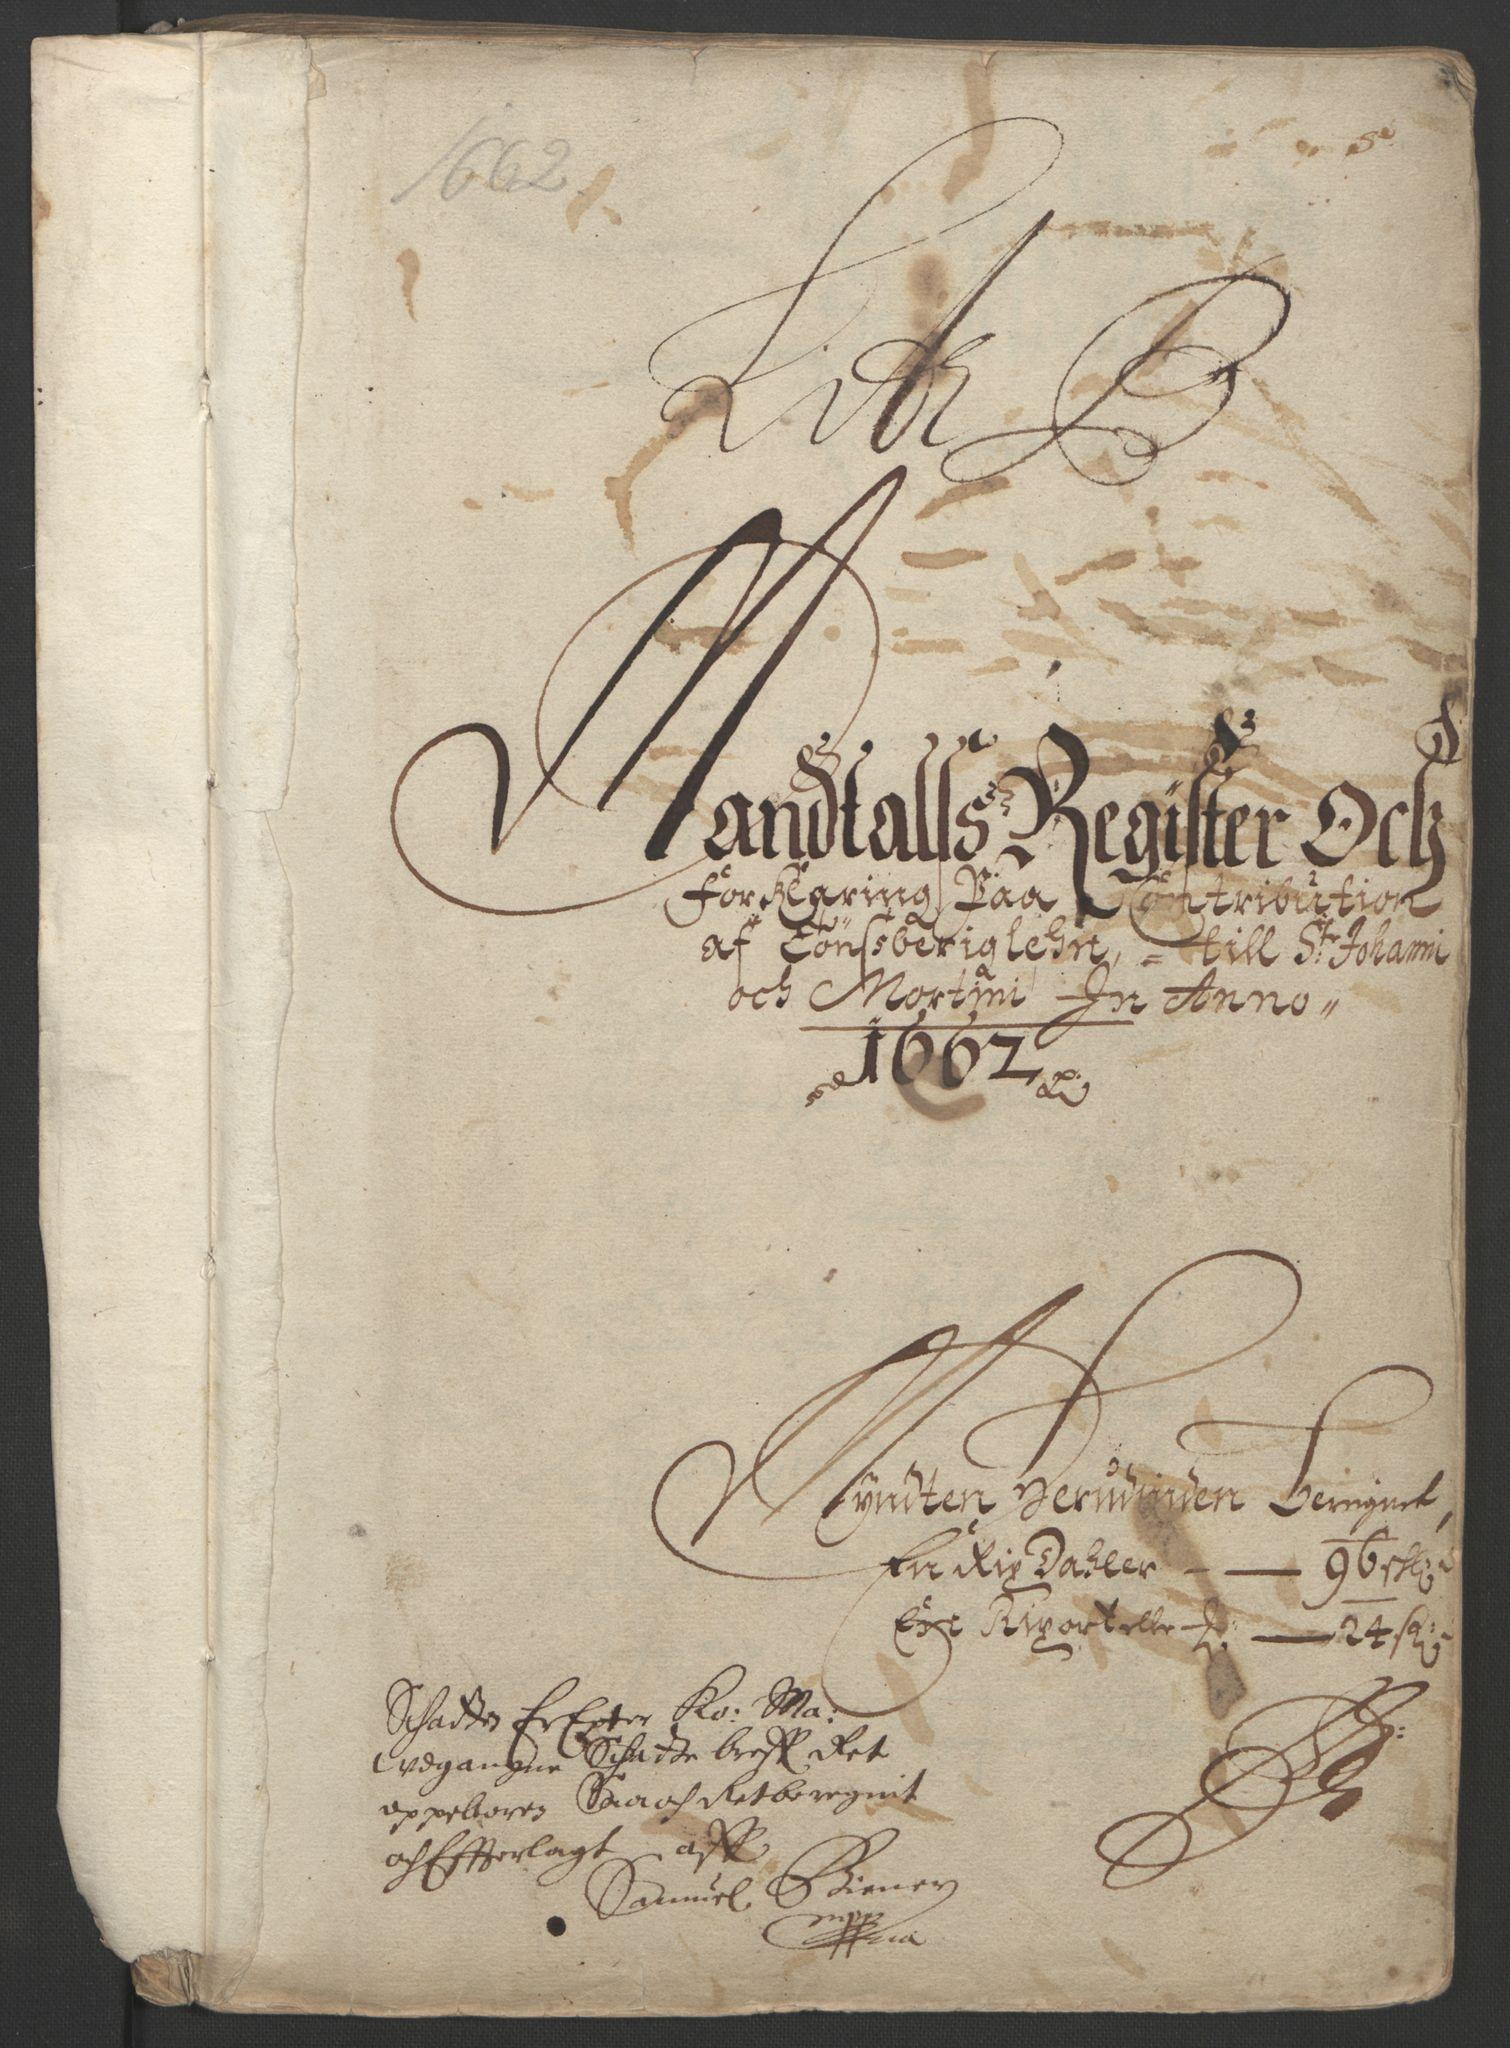 RA, Rentekammeret inntil 1814, Reviderte regnskaper, Fogderegnskap, R32/L1838: Fogderegnskap Jarlsberg grevskap, 1661-1663, s. 174